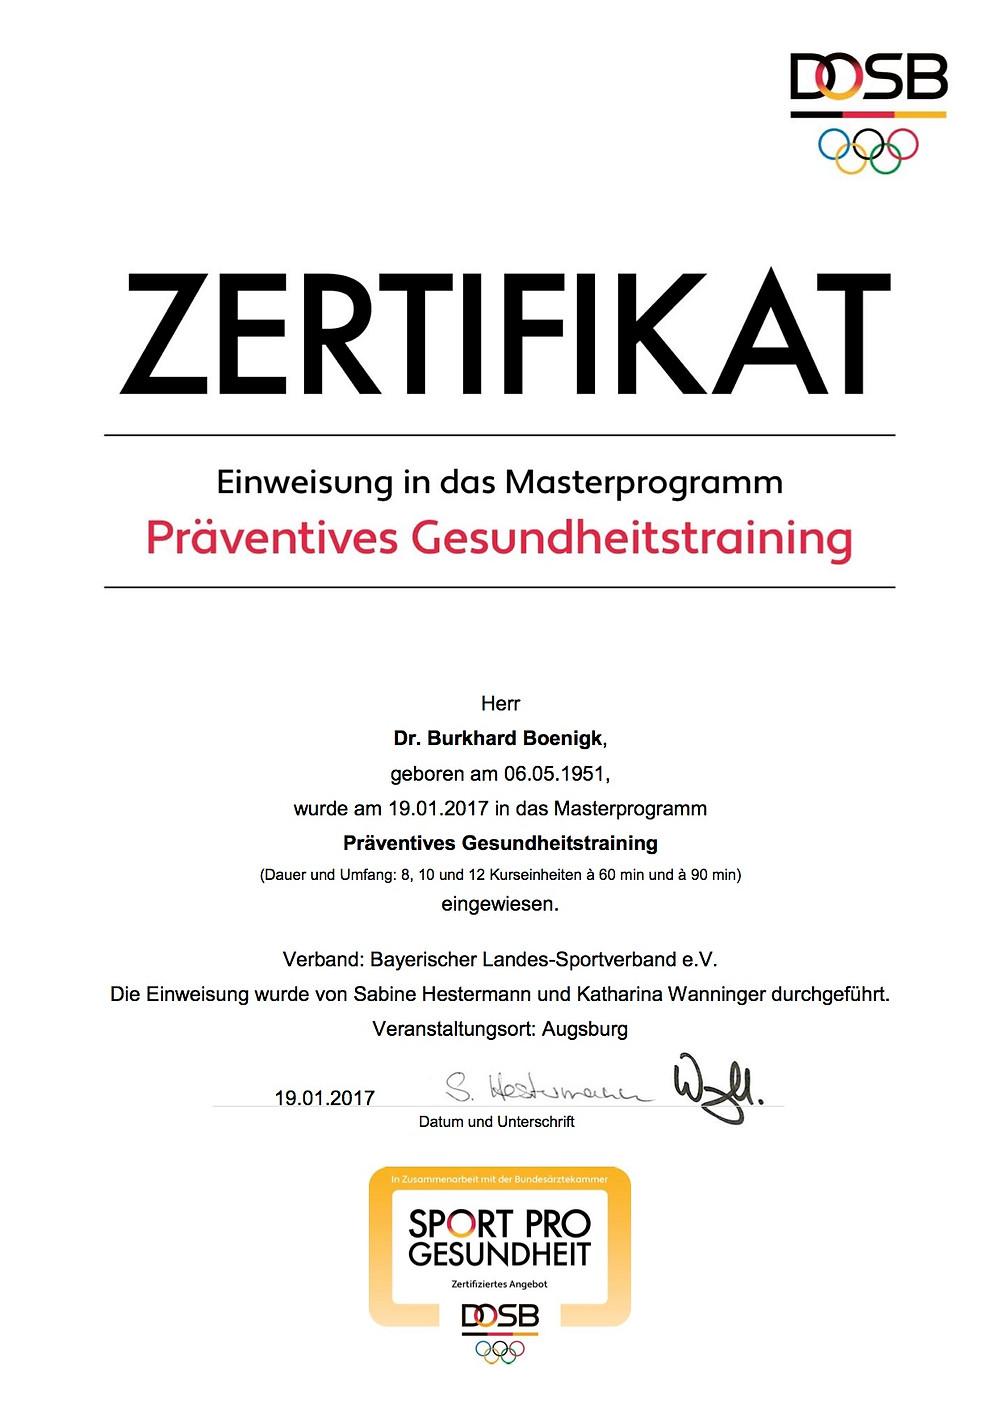 Laufinstinkt+ Schwaben Augsburg - DOSB-Zertifikat Präventives Gesundheitstraining